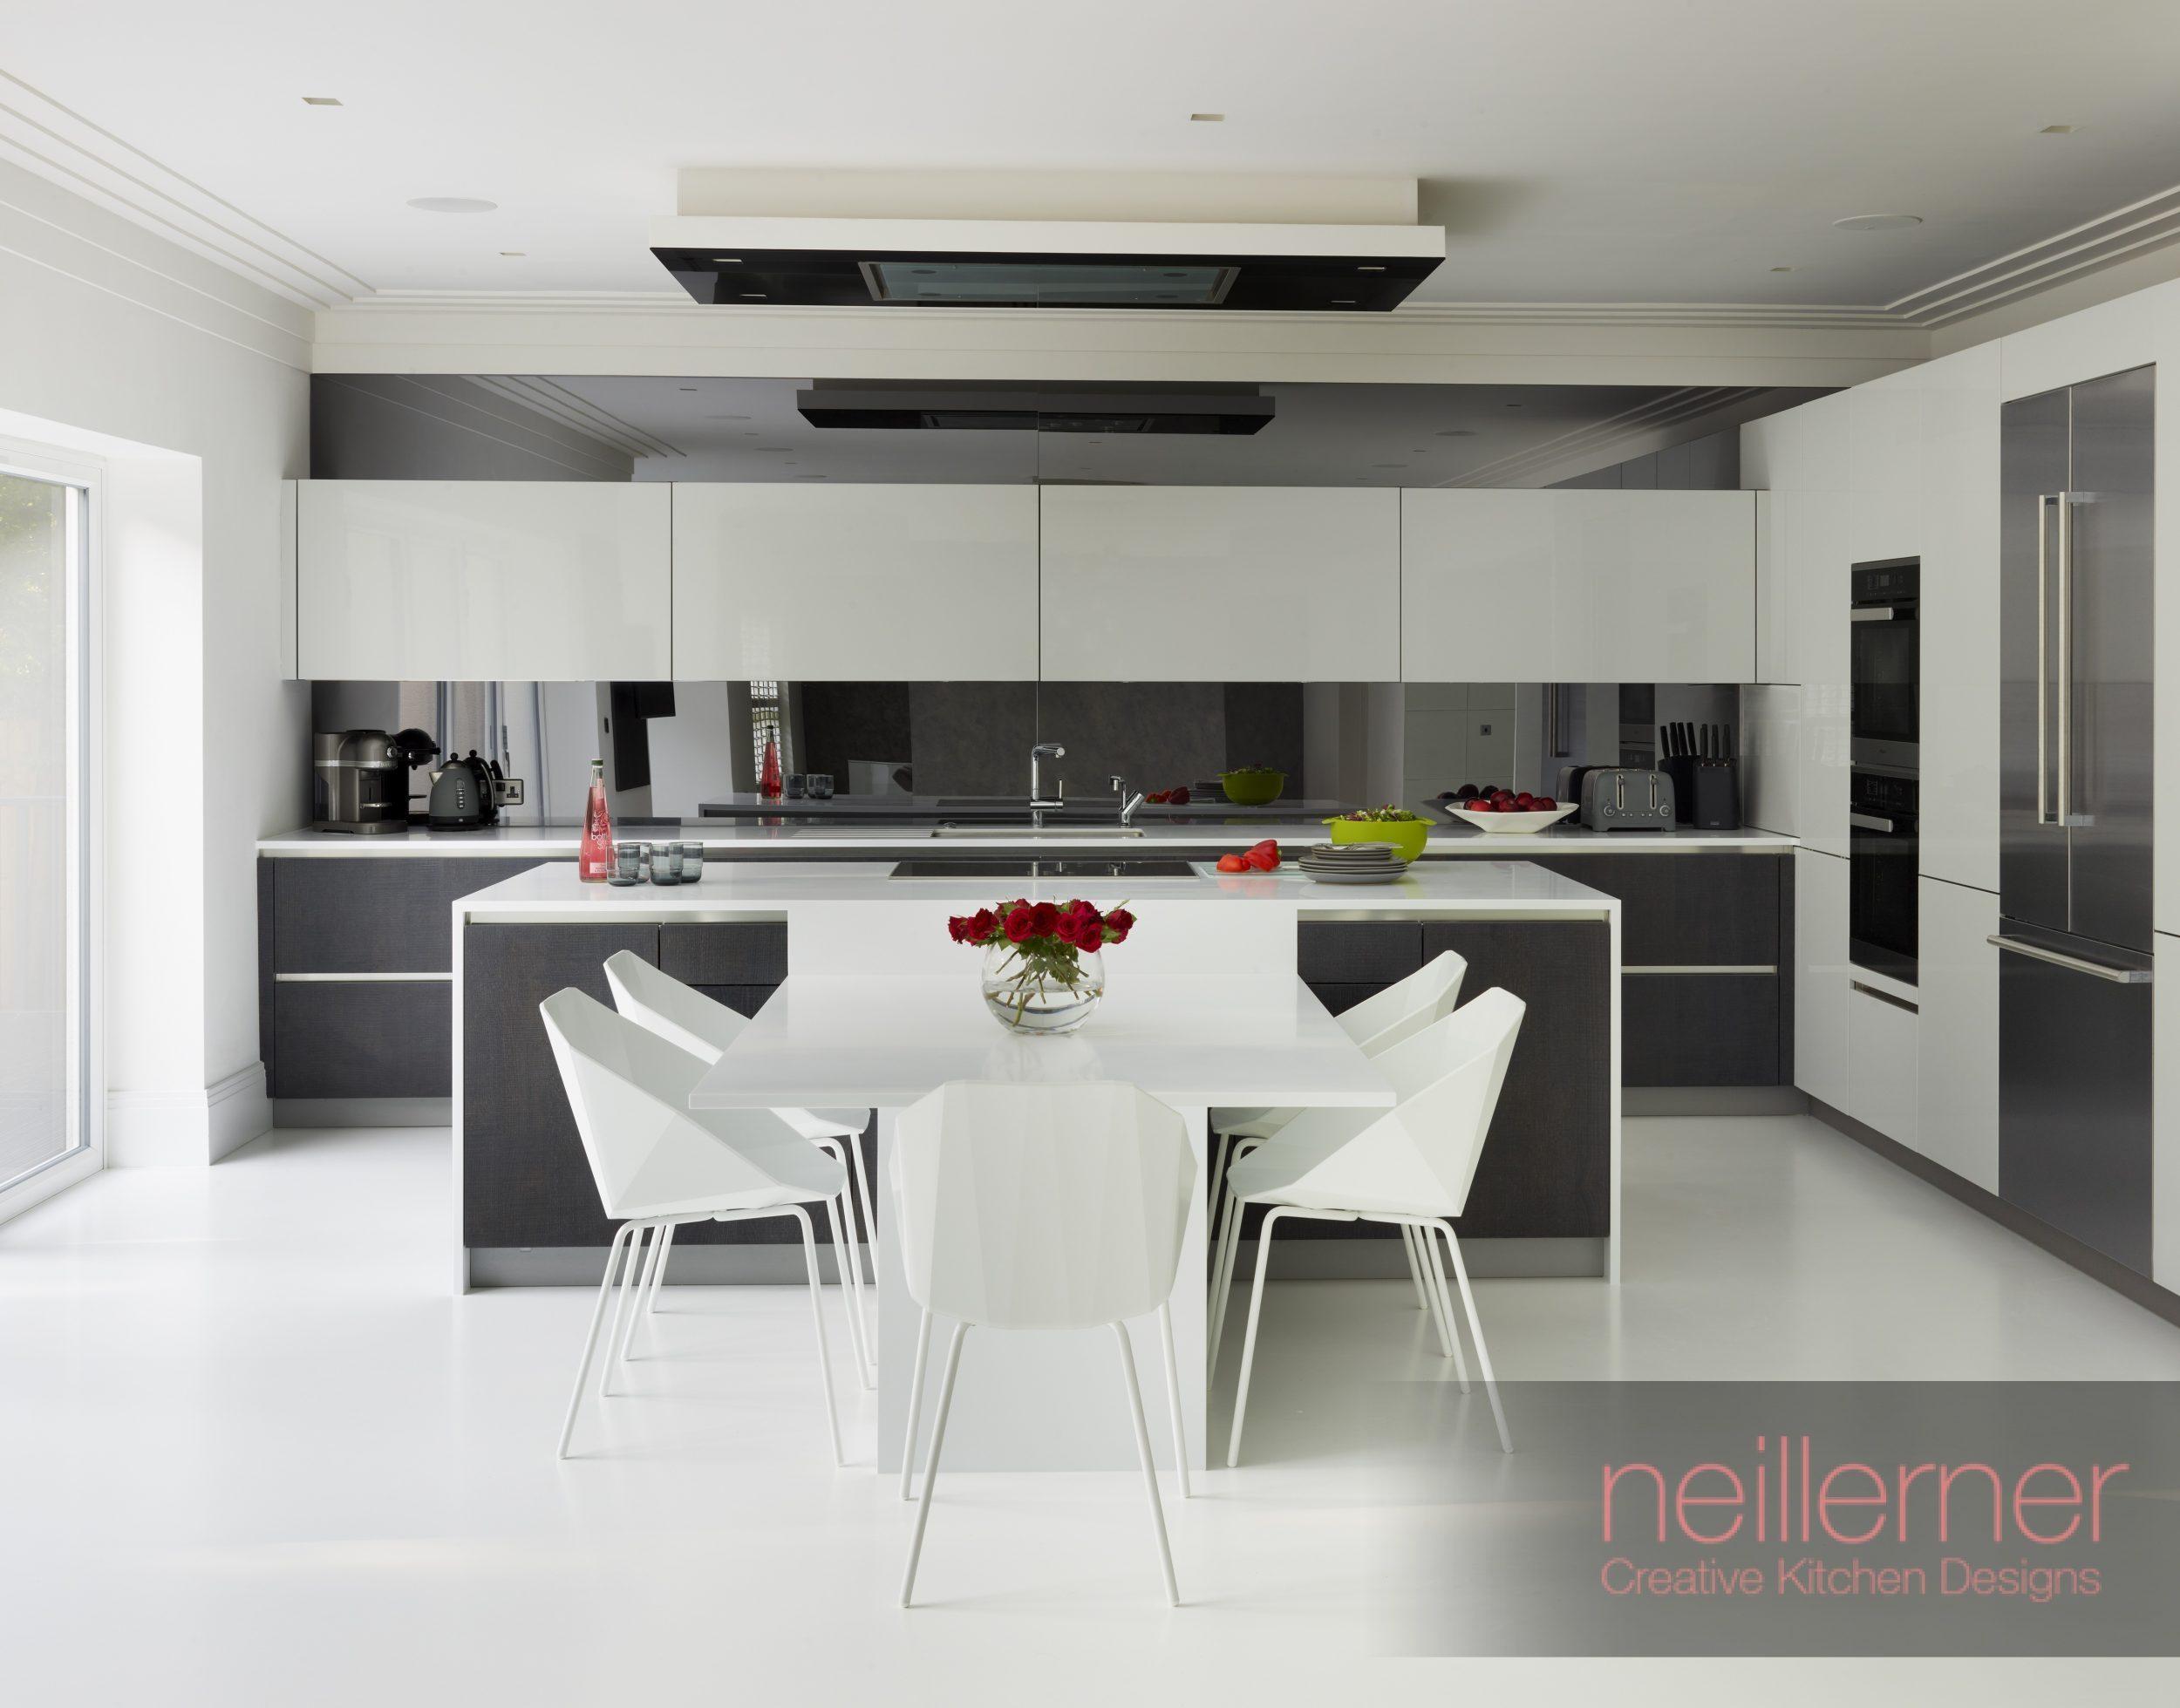 Dream Kitchens Clutter Free Family Kitchens Neil Lerner - Family-kitchen-design